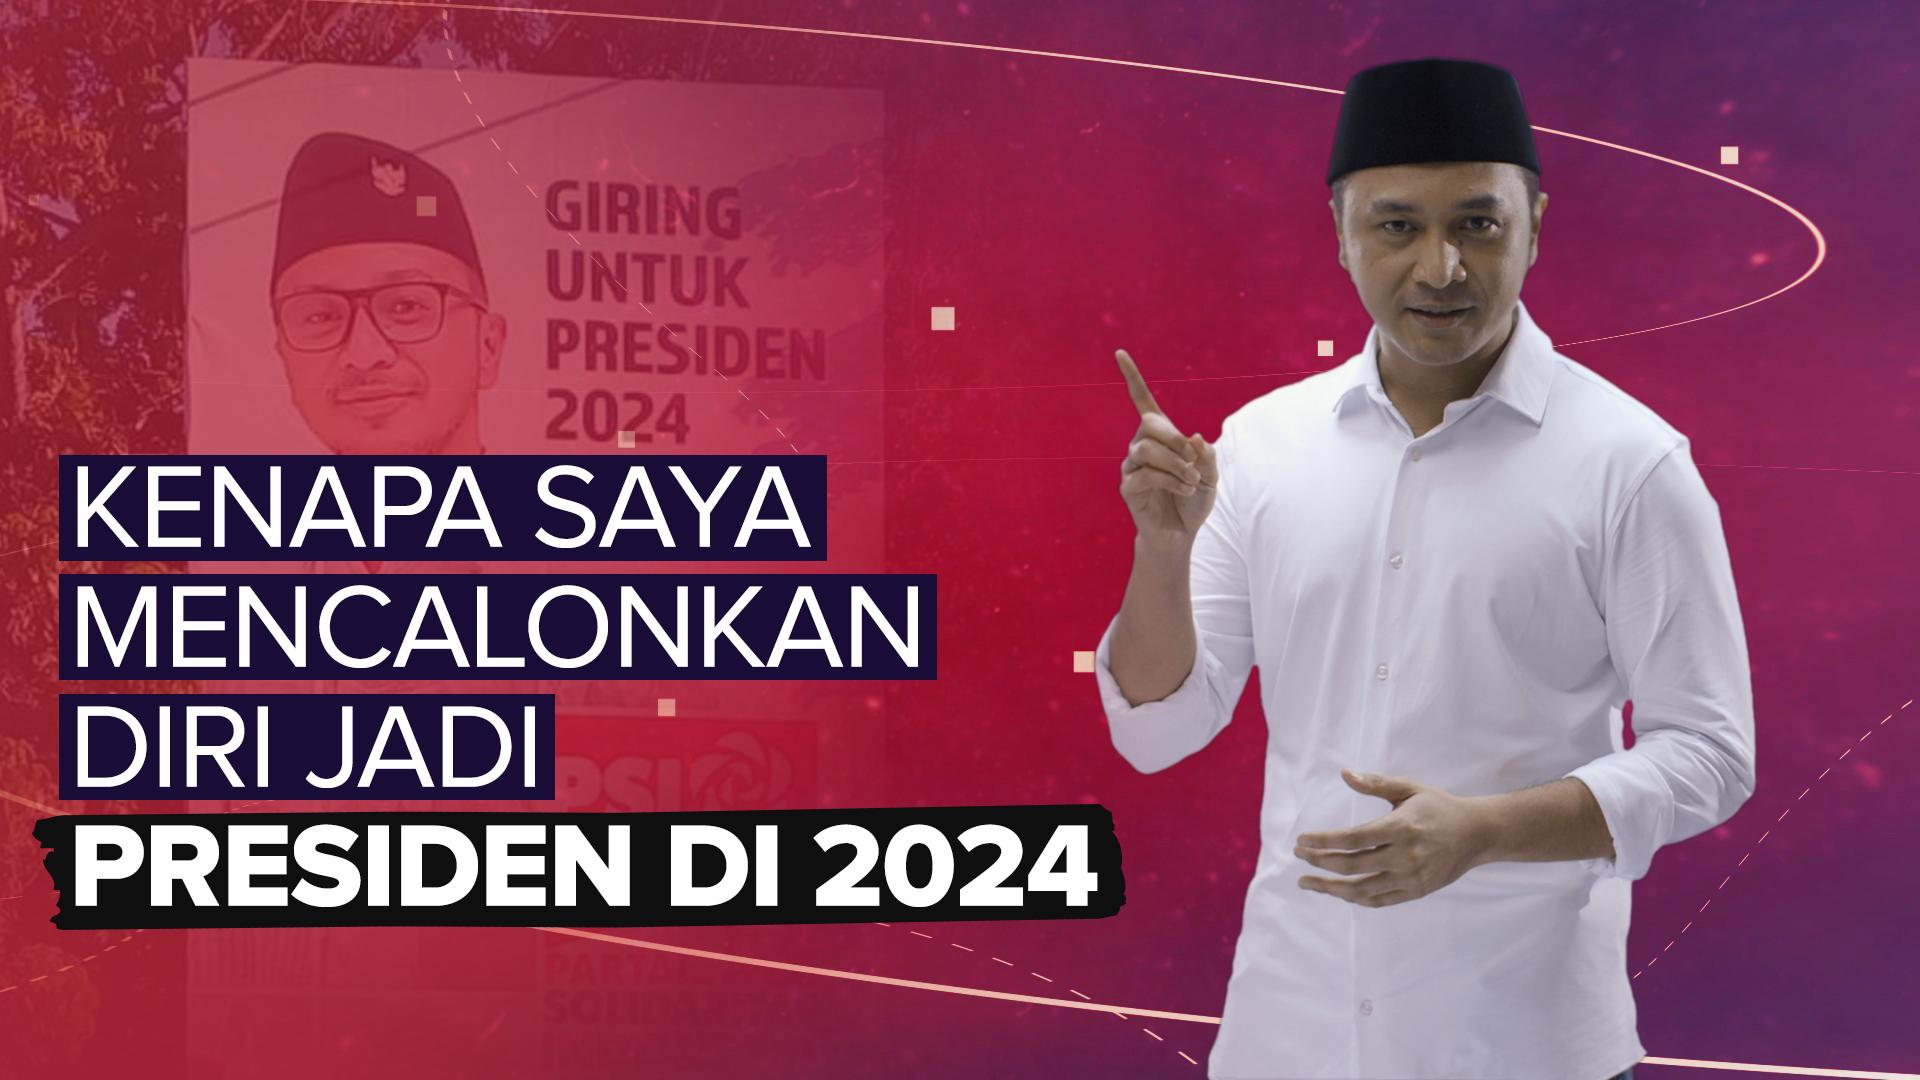 Kisah Kita, Alasan Giring Maju Menjadi Calon Presiden RI 2024